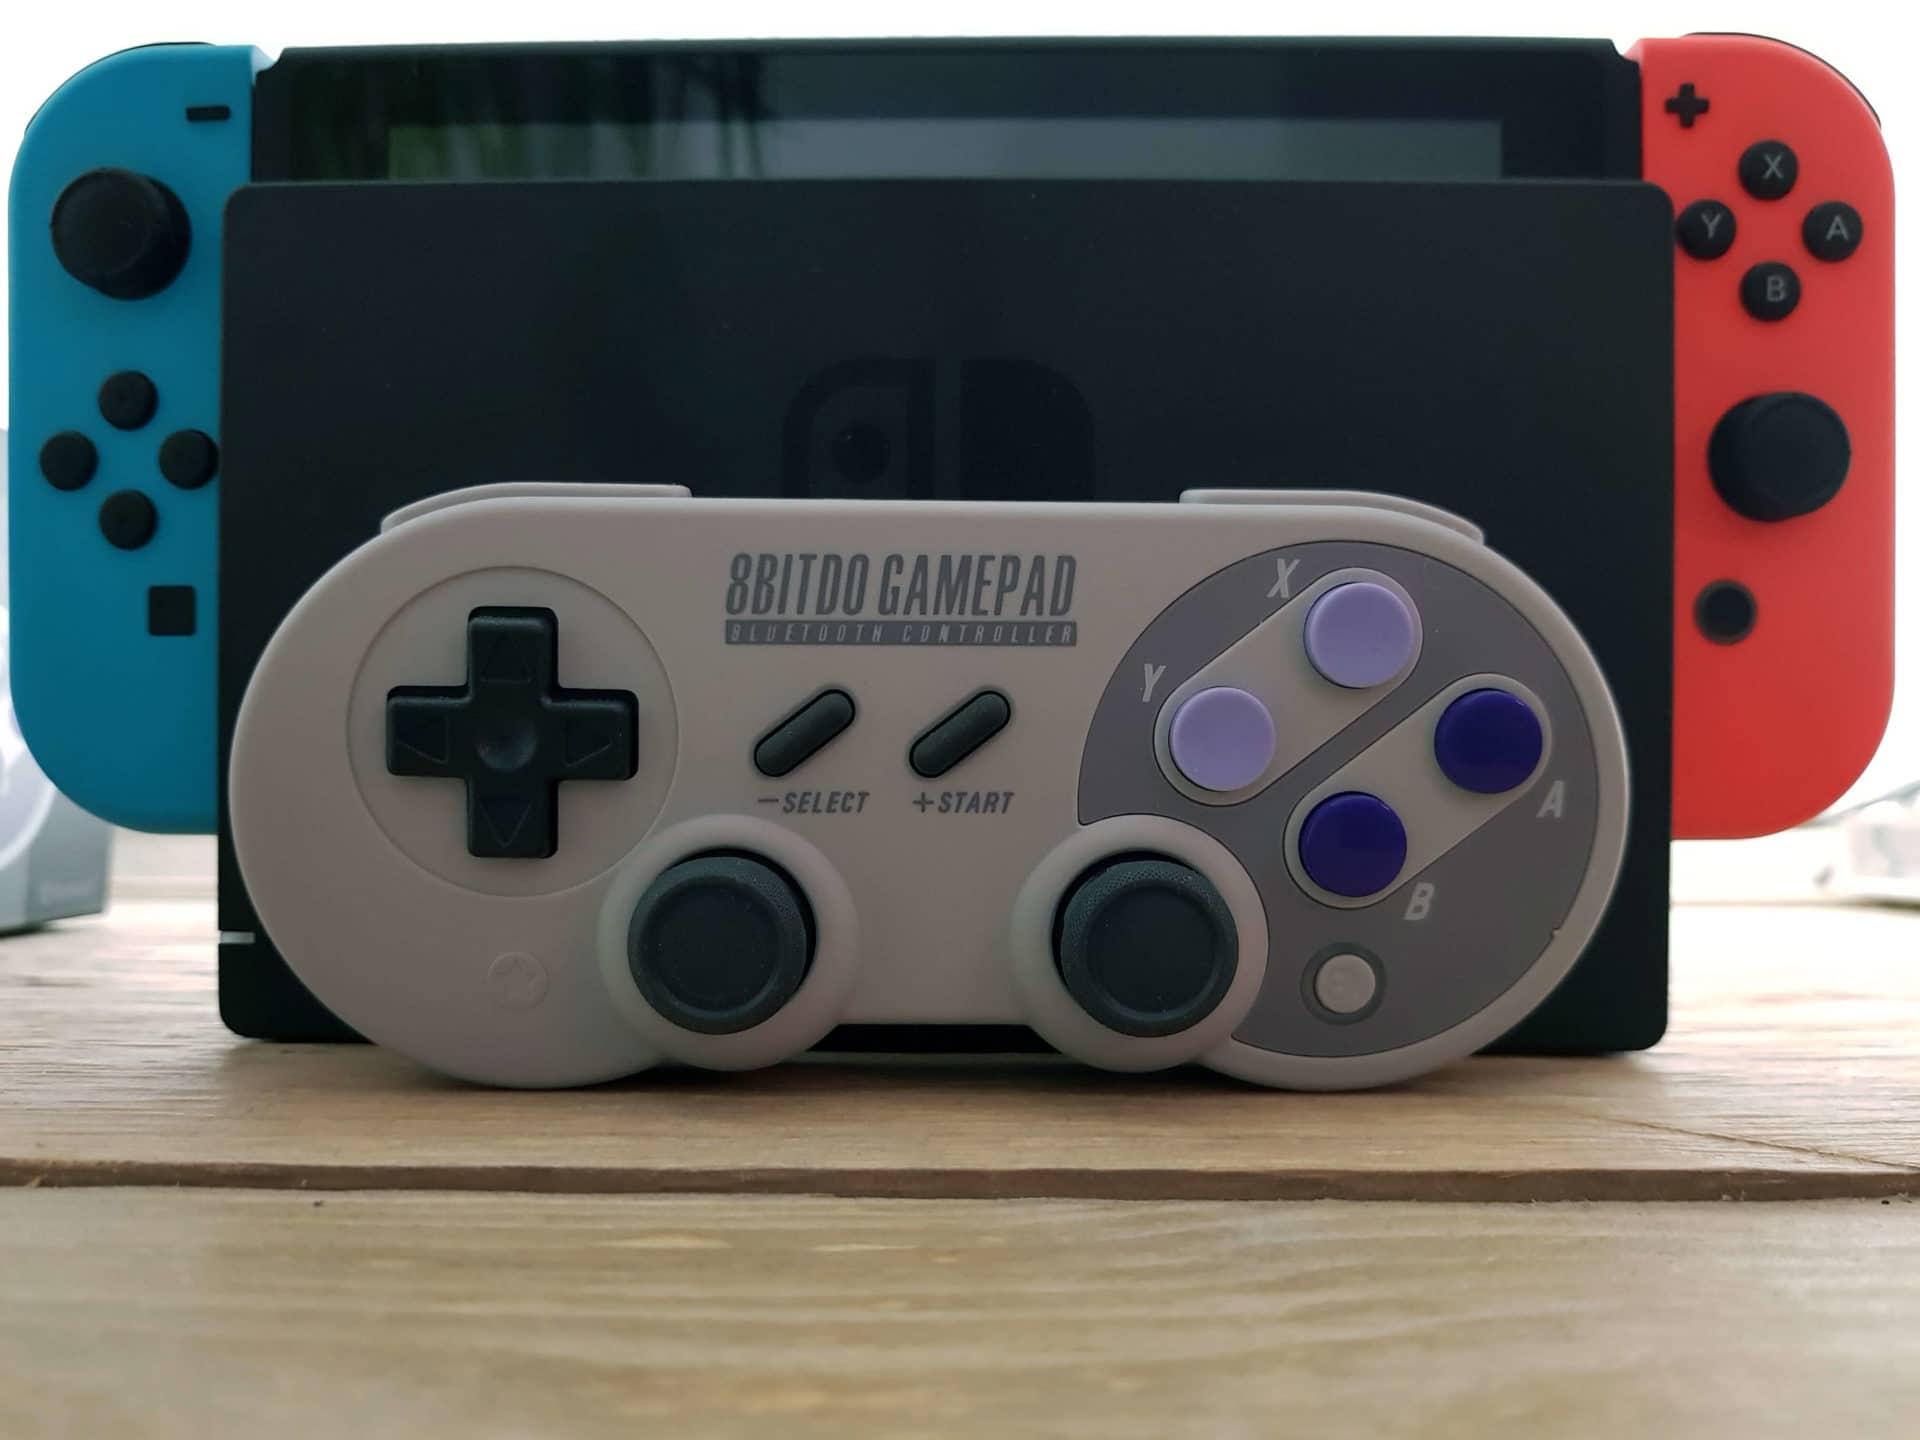 8Bitdo SN30 PRO Gamepad Test: Switch Controller im Retro Design techboys.de • smarte News, auf den Punkt!